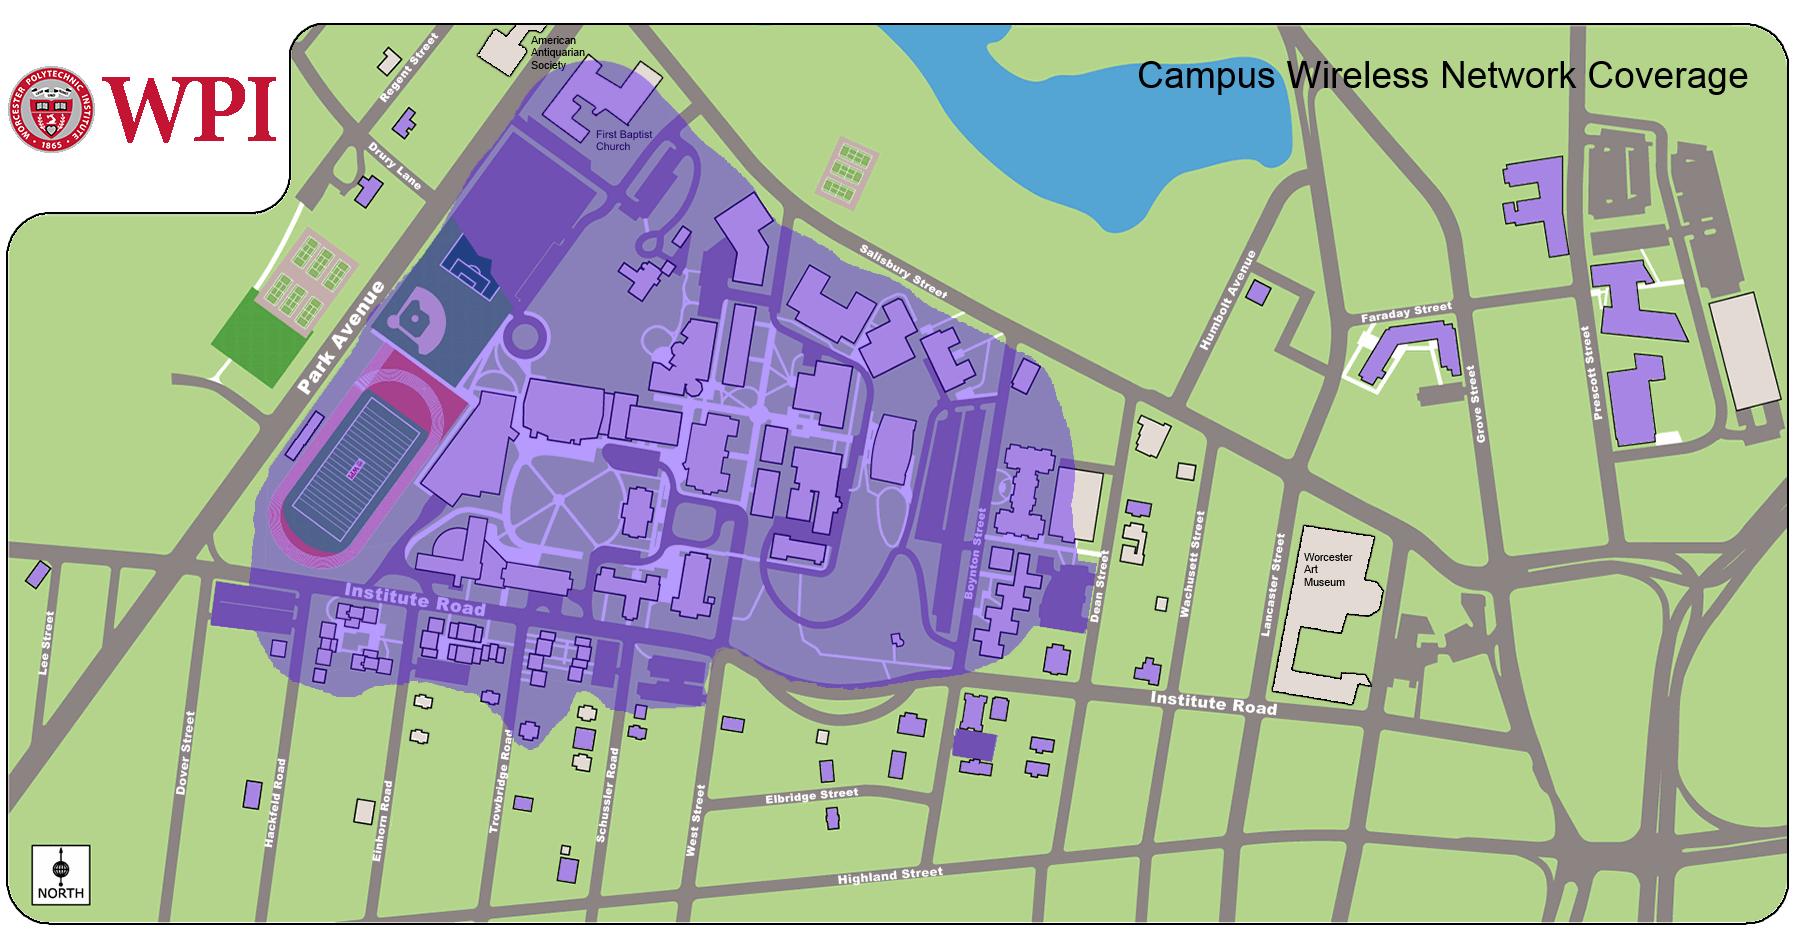 wireless city planning wikipedia 8266015 neutralizeallinfo